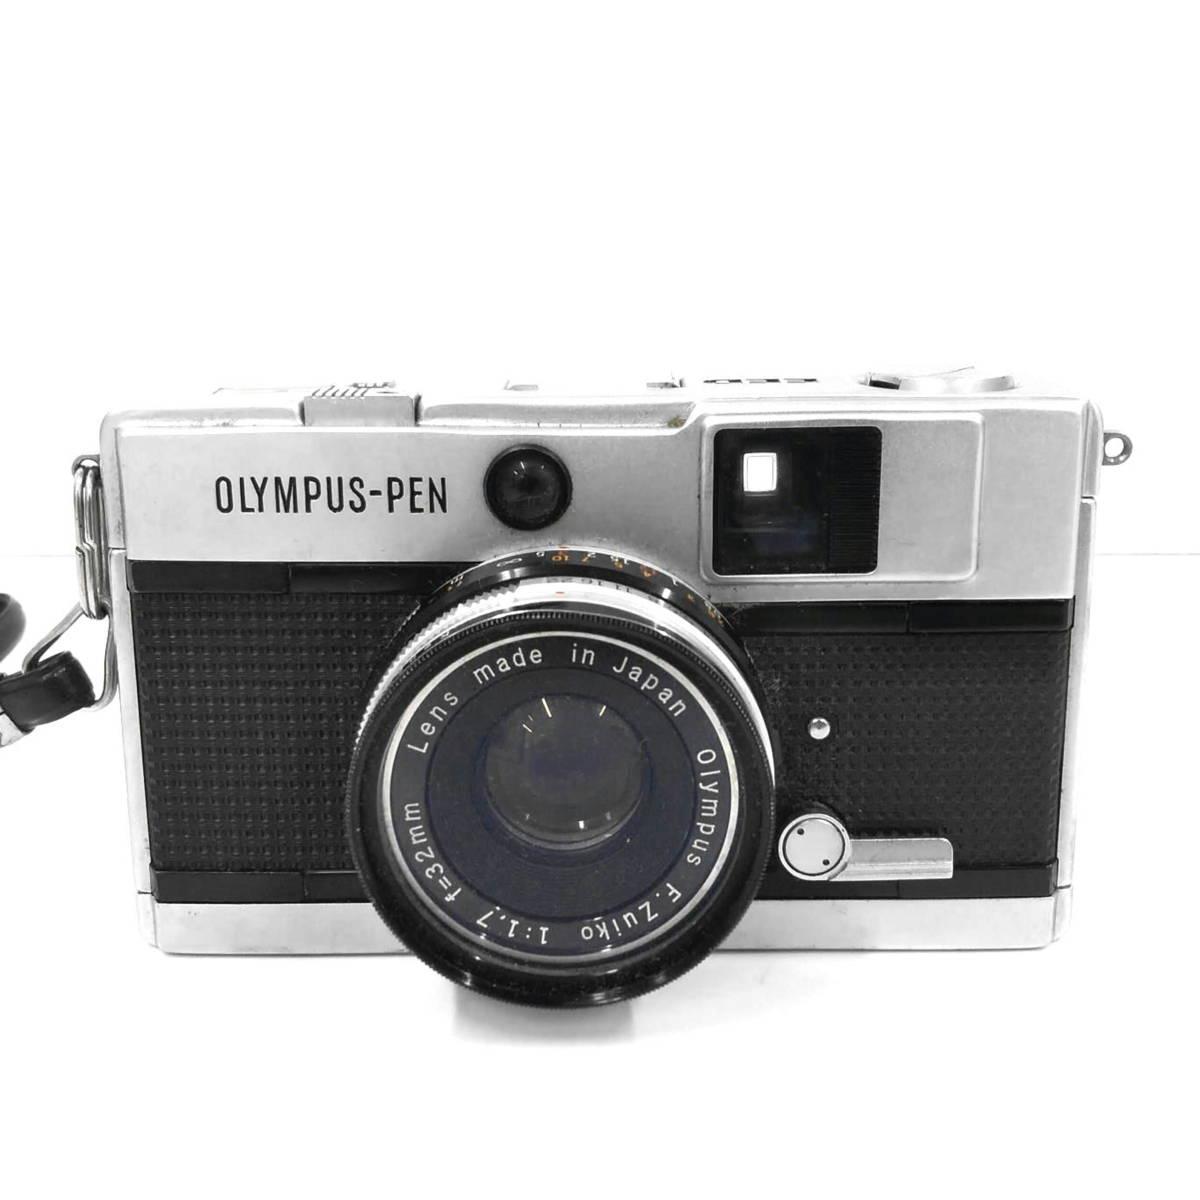 OLYMPUS-PEN EED オリンパスペン 短焦点レンズ F.Zuiko f1.7 32mm_画像1